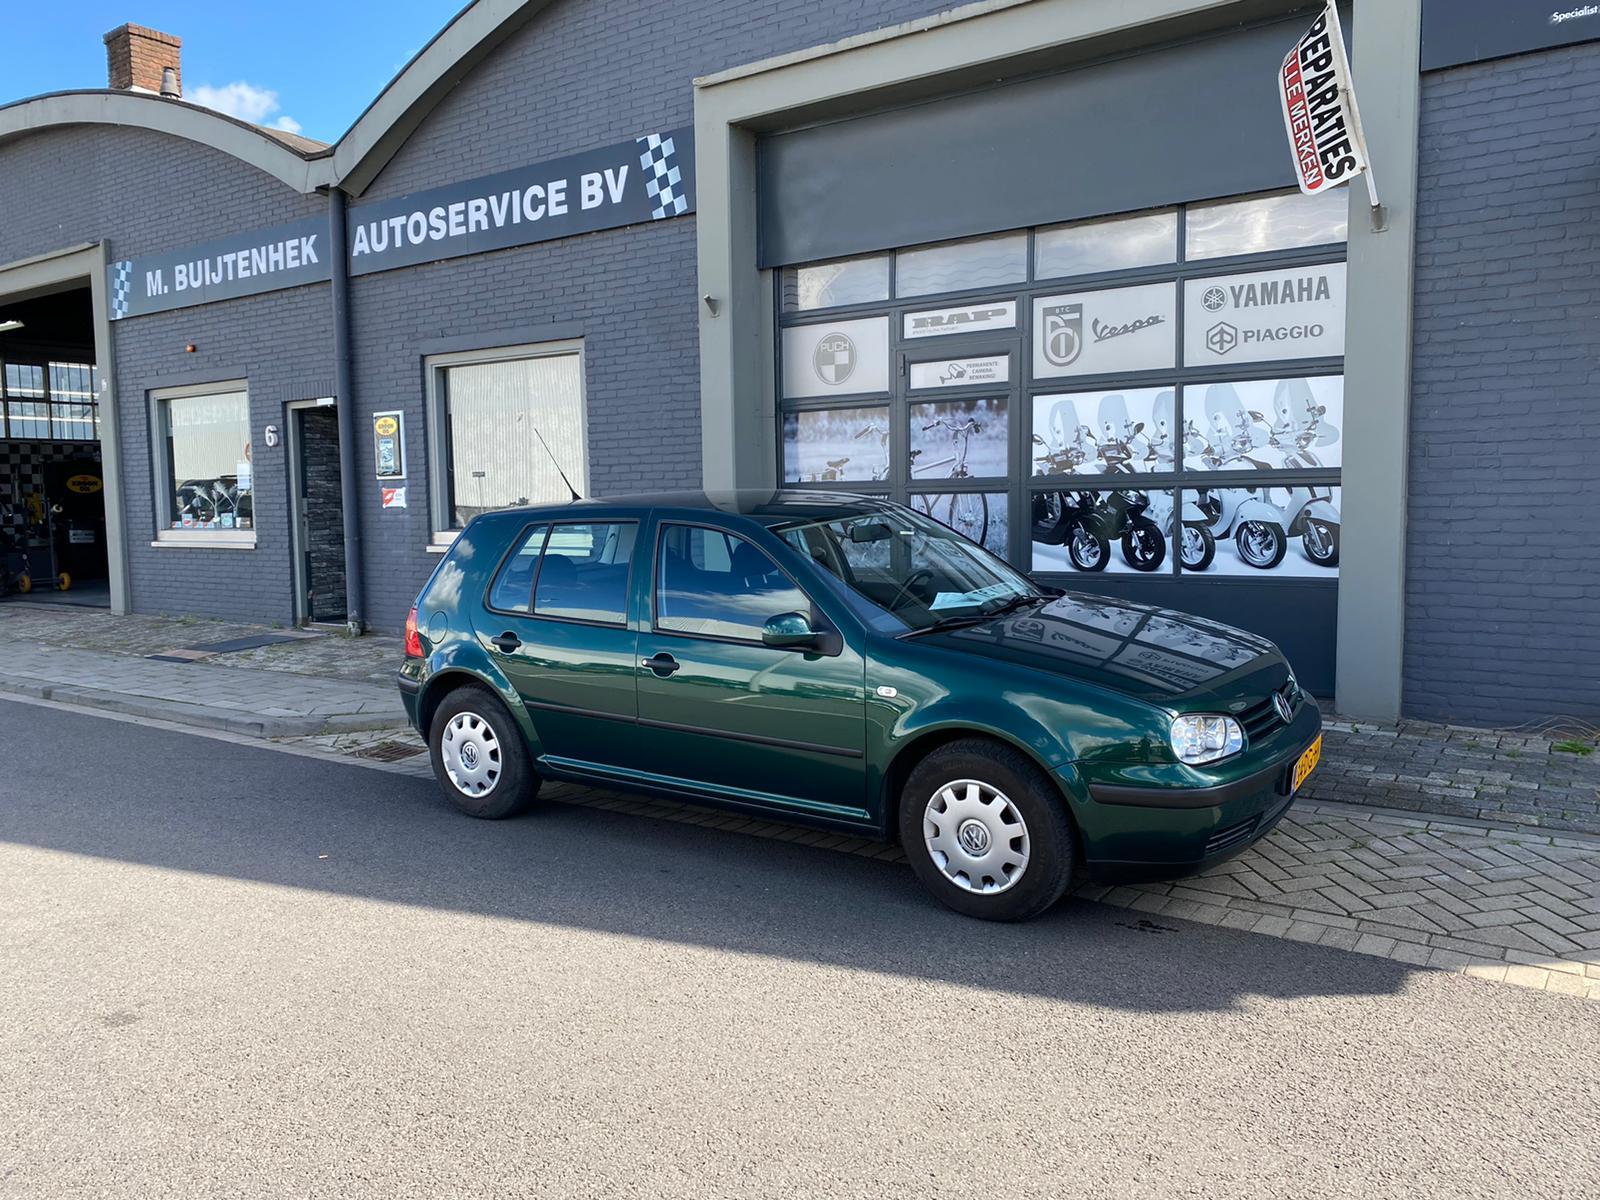 Volkswagen Golf 4 1.4 16v full